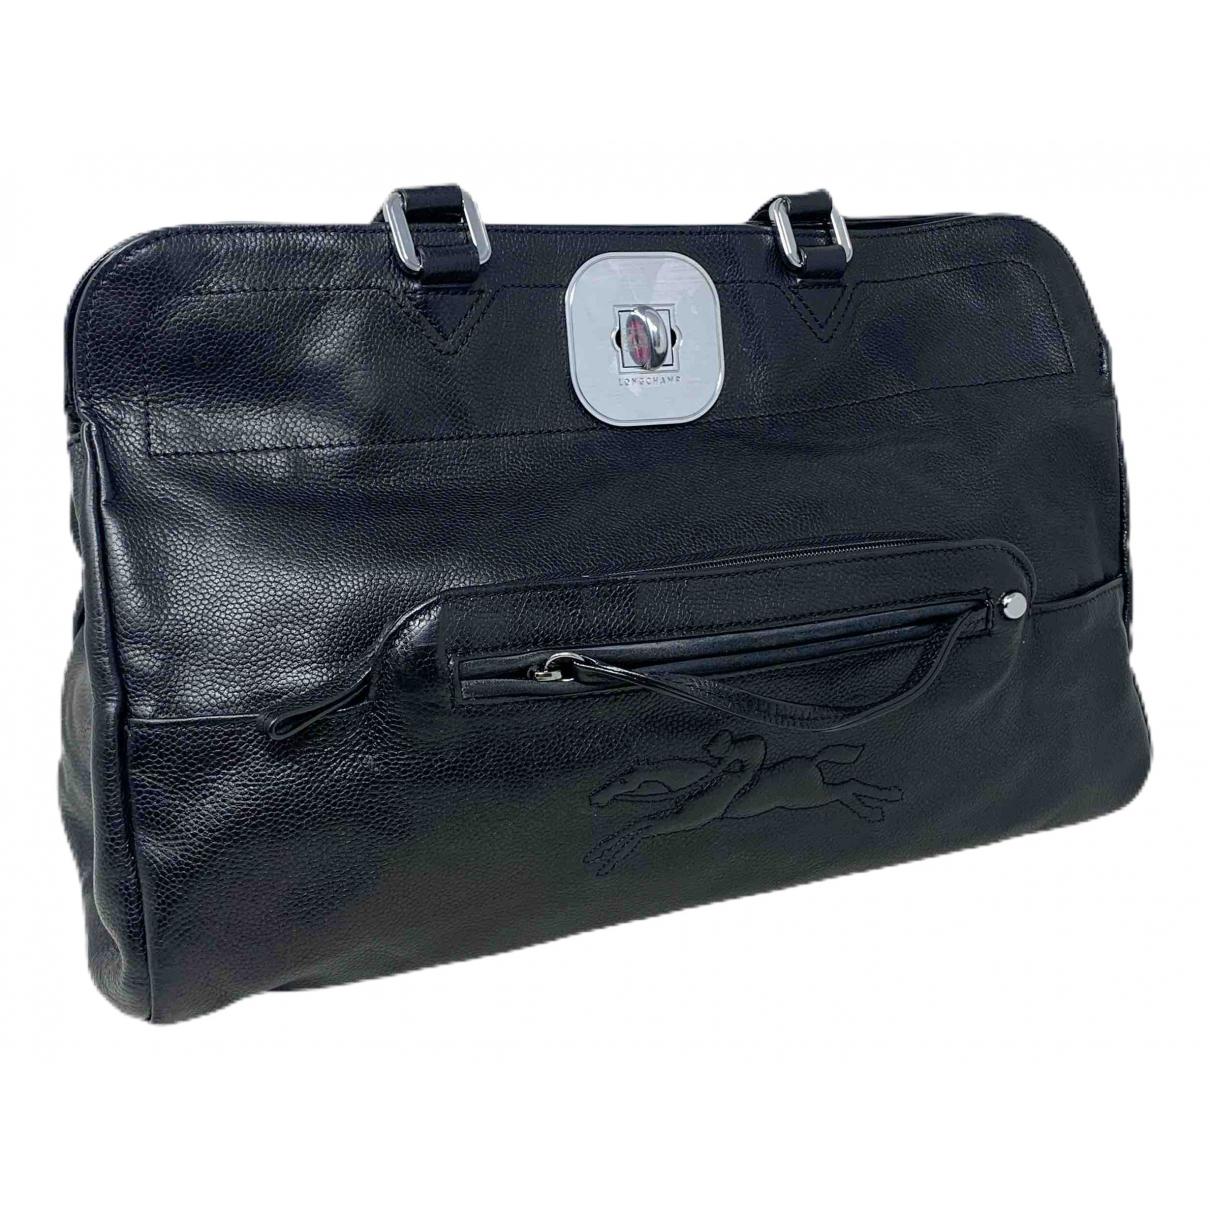 Longchamp - Sac a main Gatsby pour femme en cuir - noir